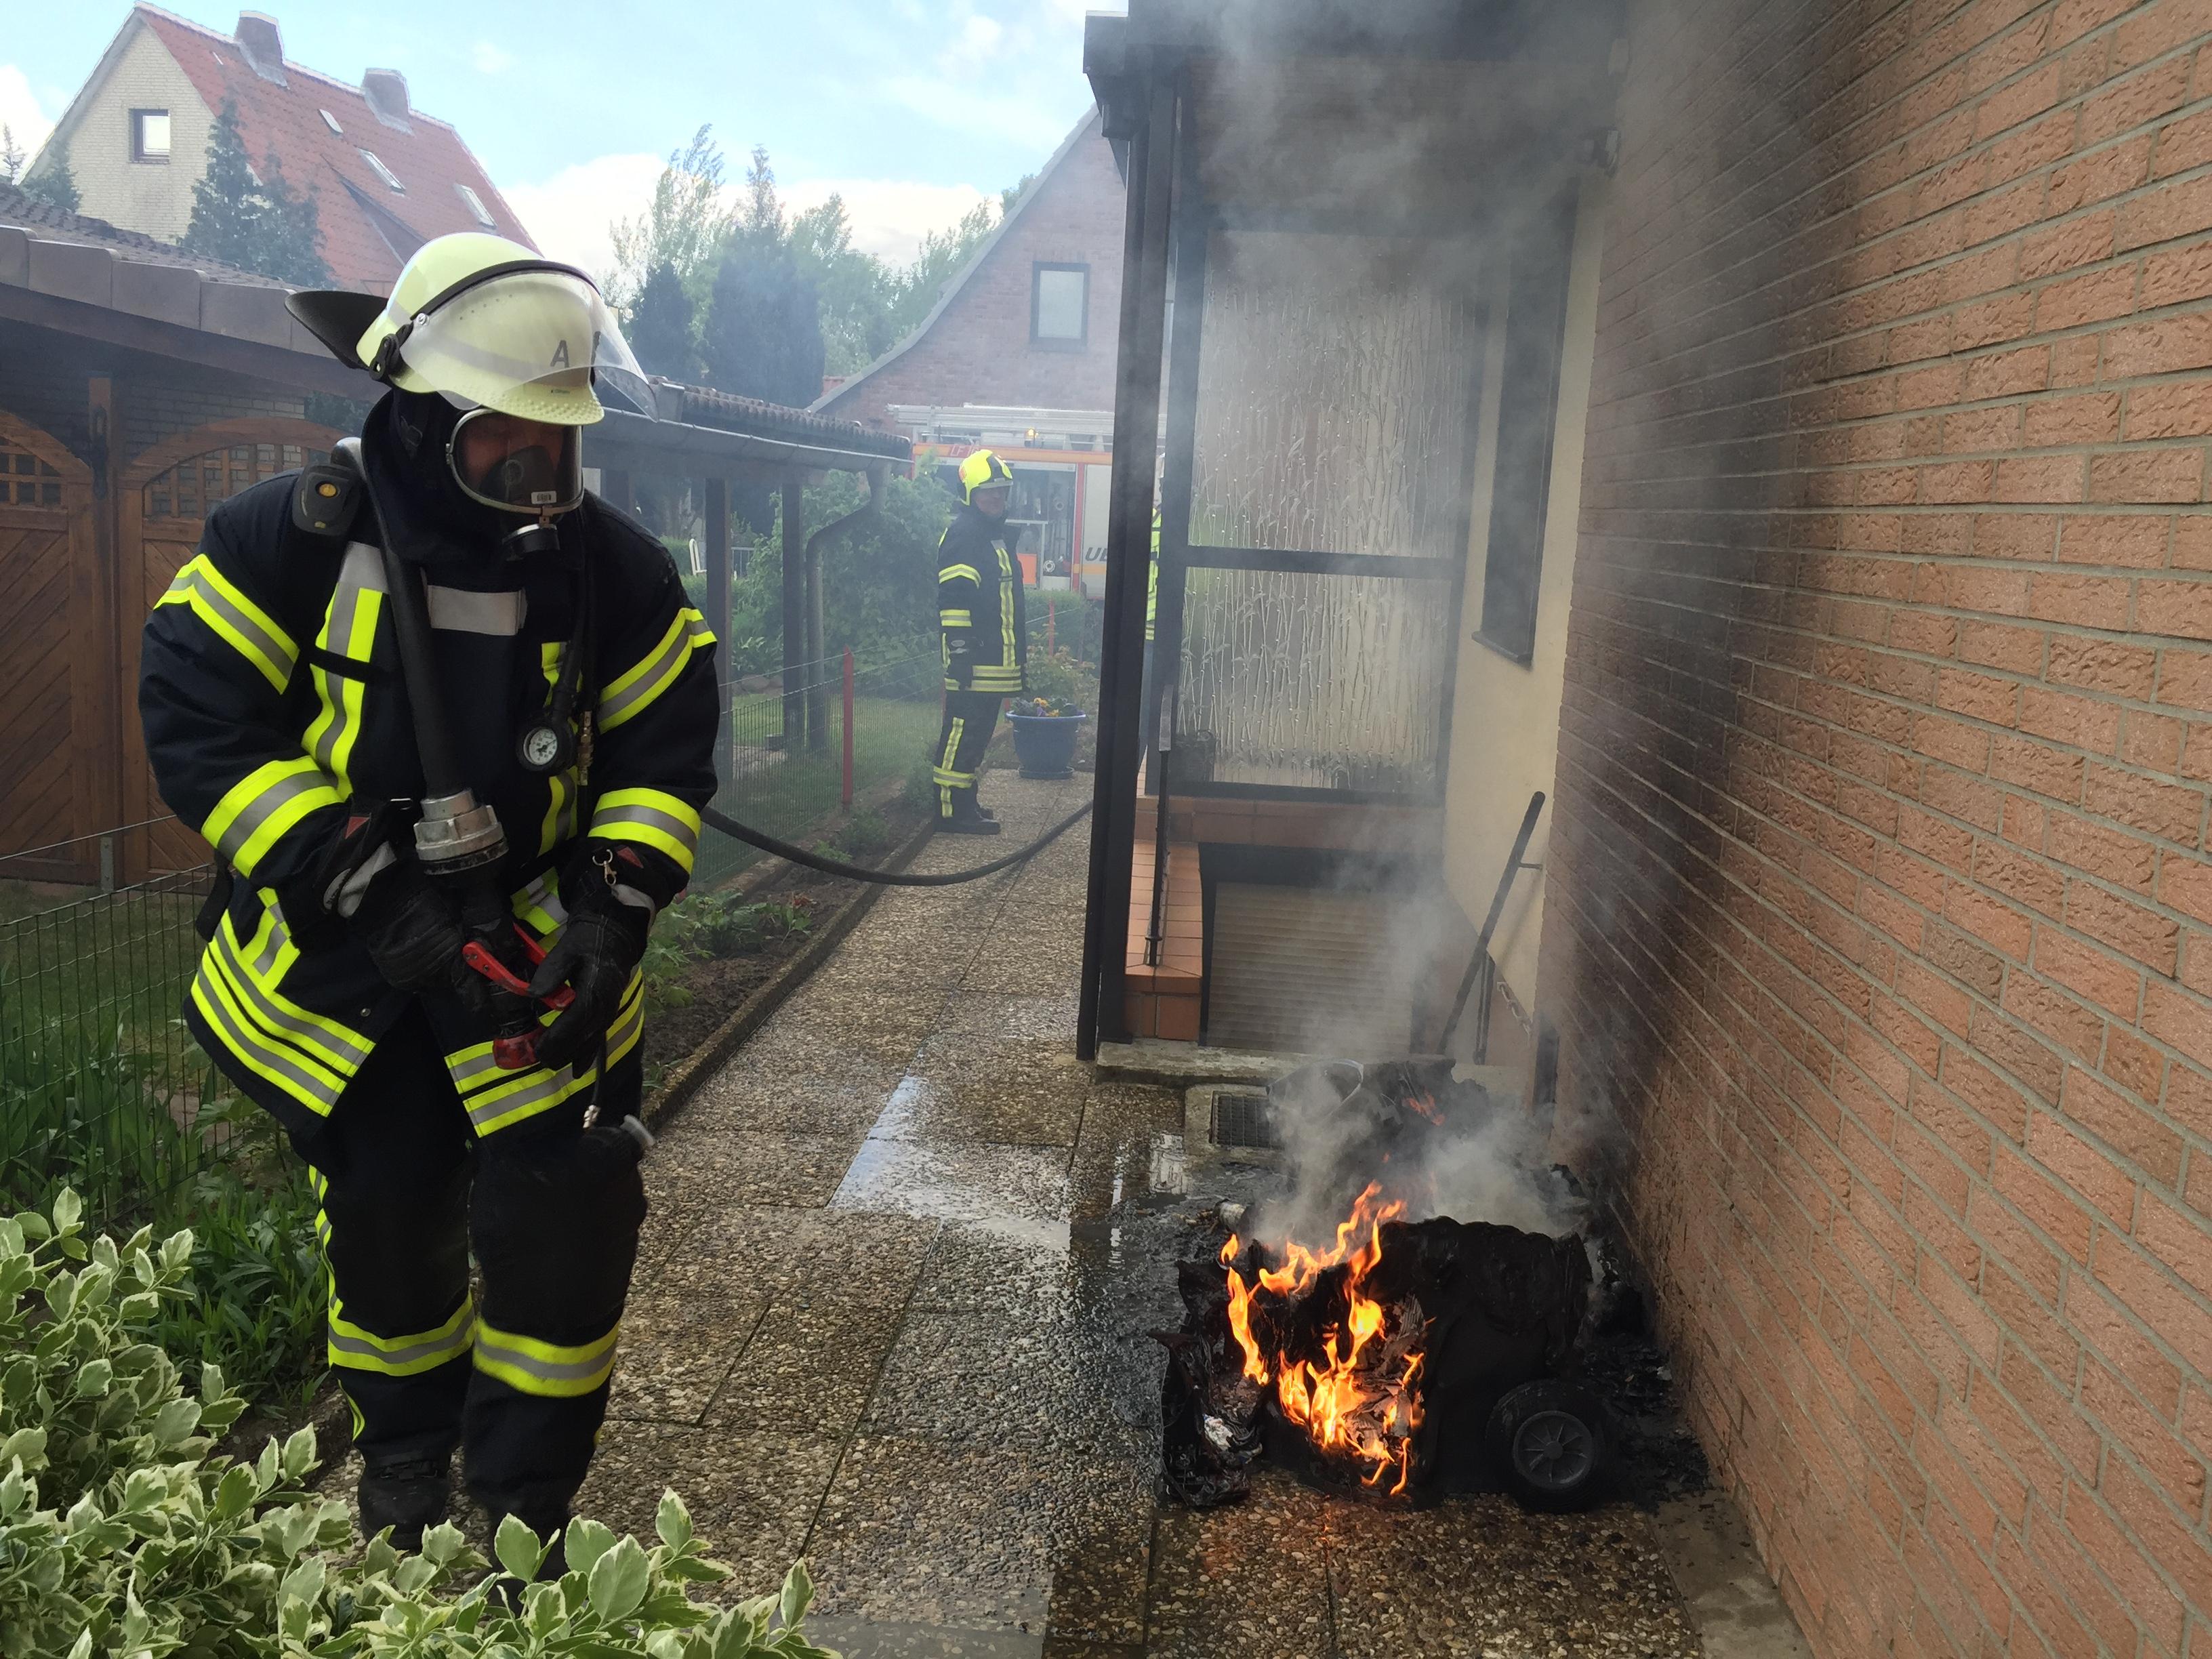 099. Brennen Mülltonnen am Wohnhaus